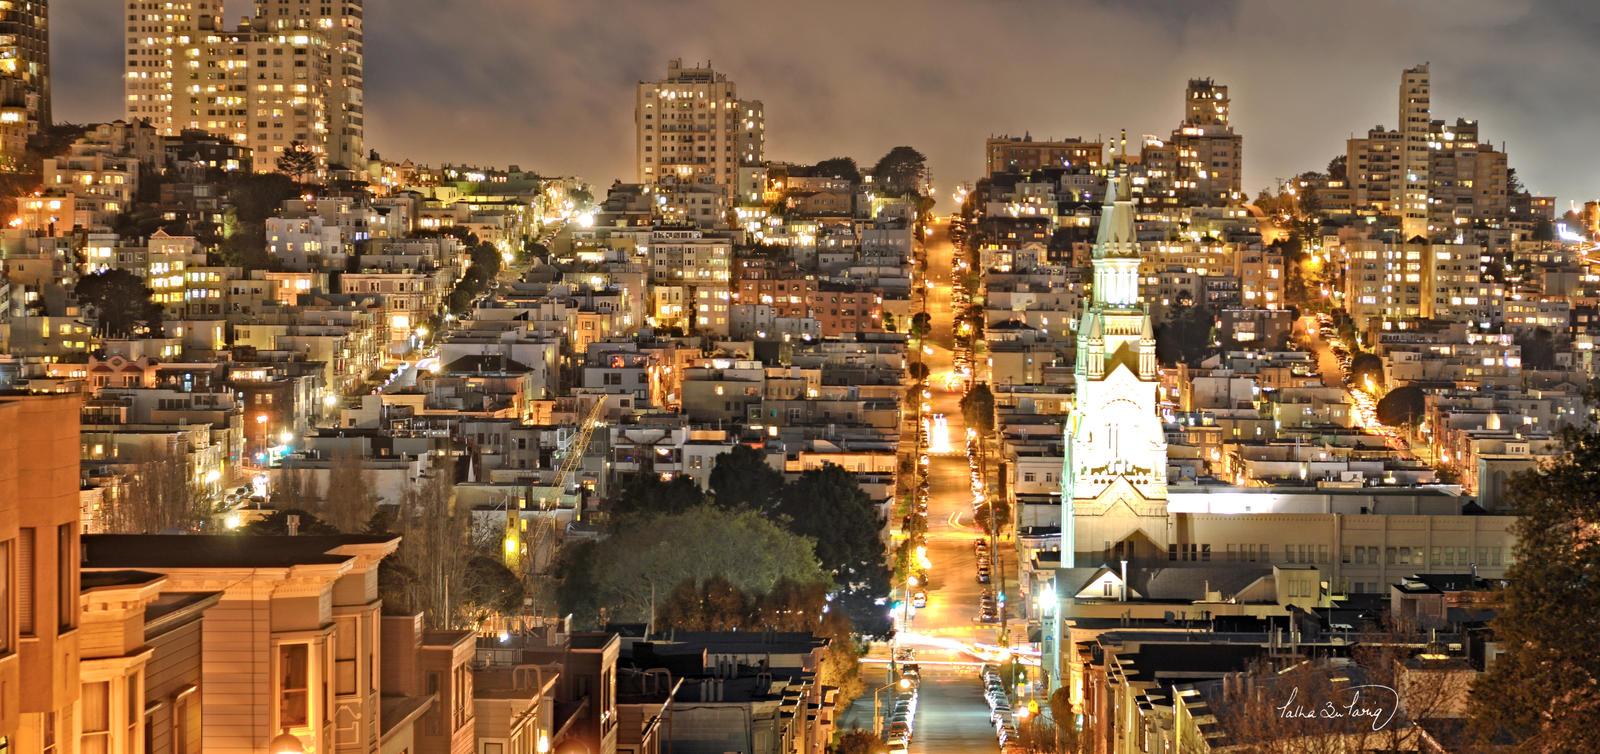 Telegraph Hill - San Francisco